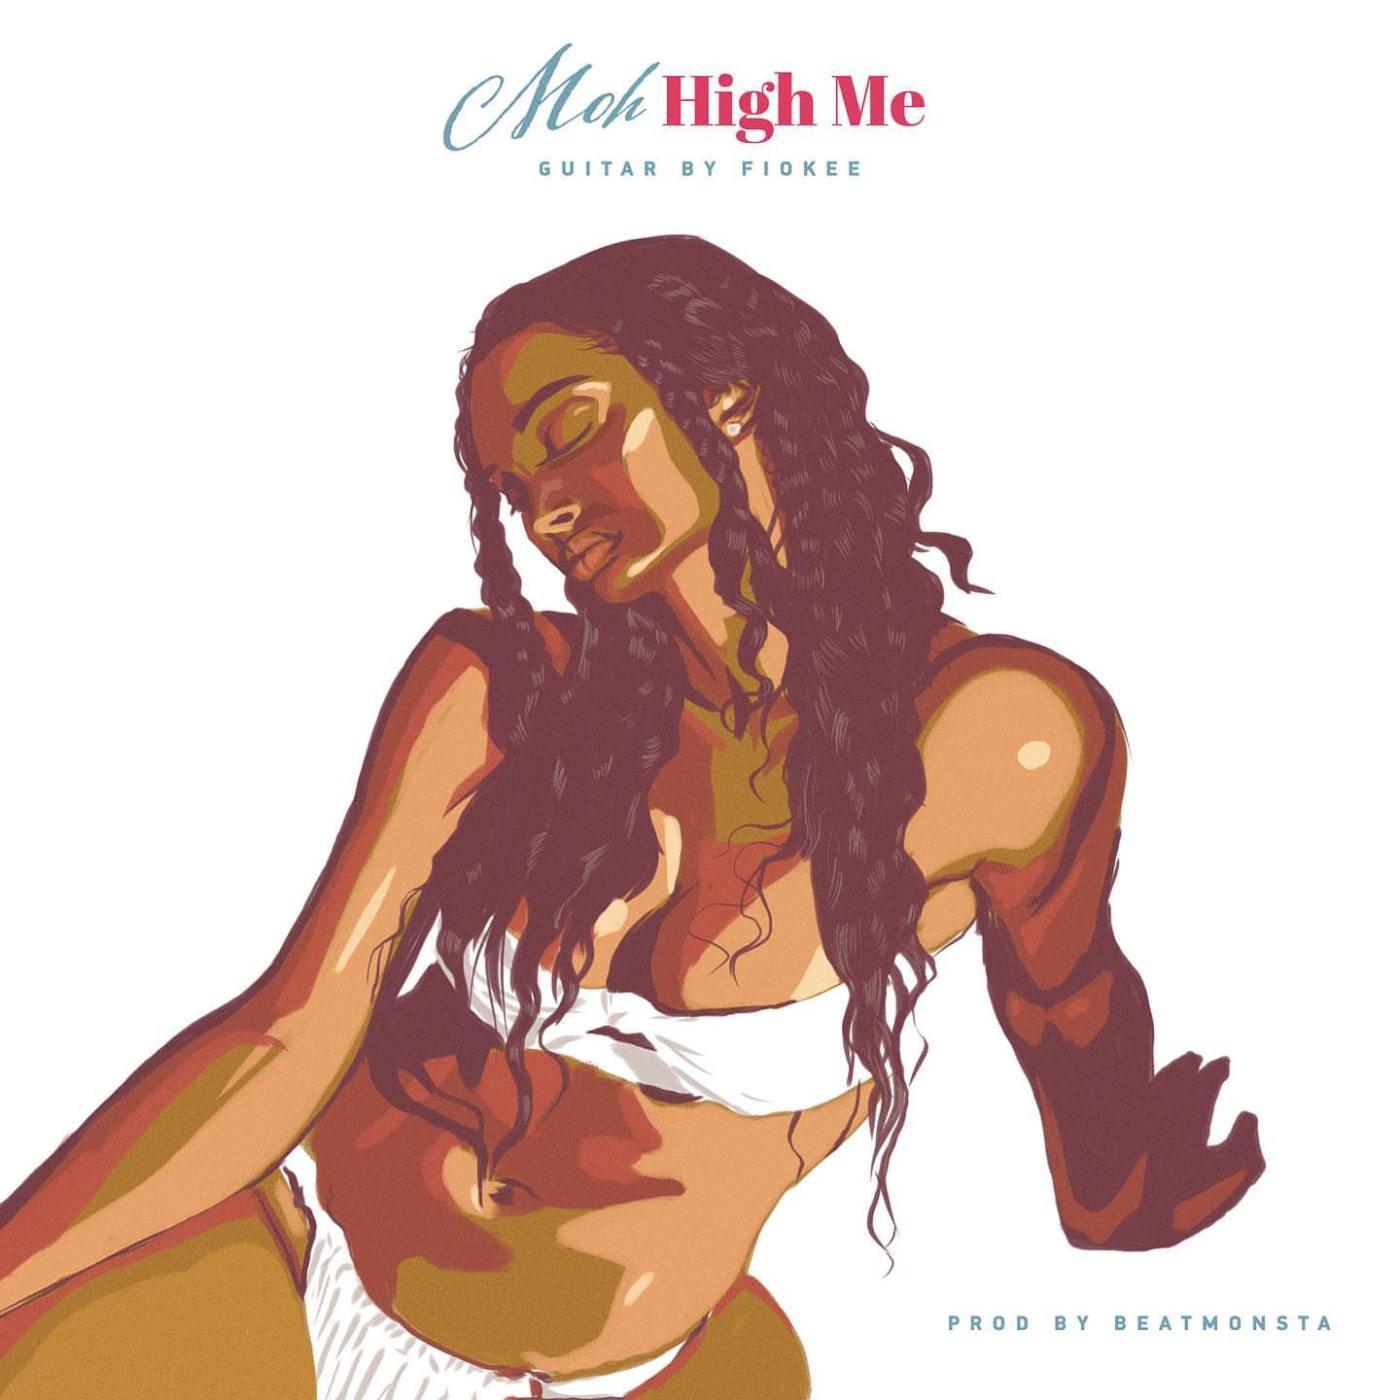 Moh - High Me